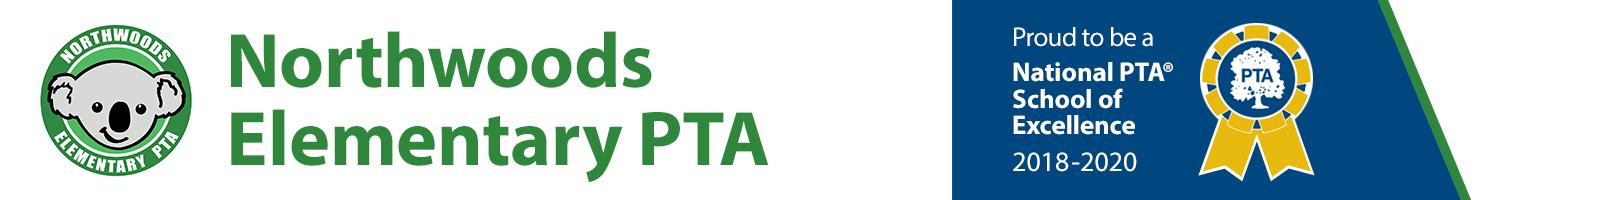 Northwoods Elementary PTA Logo